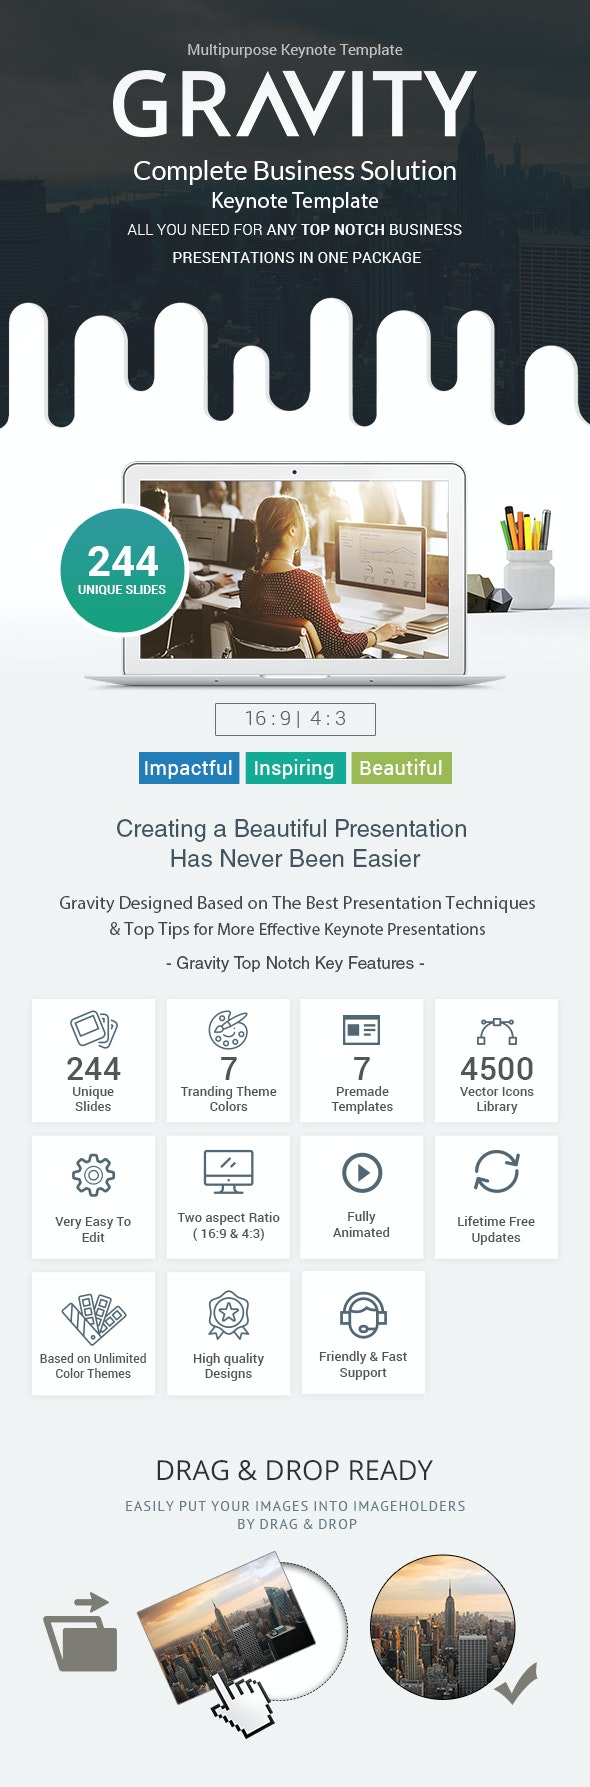 Gravity Keynote Presentation Template - Best Business Solutions - Business Keynote Templates